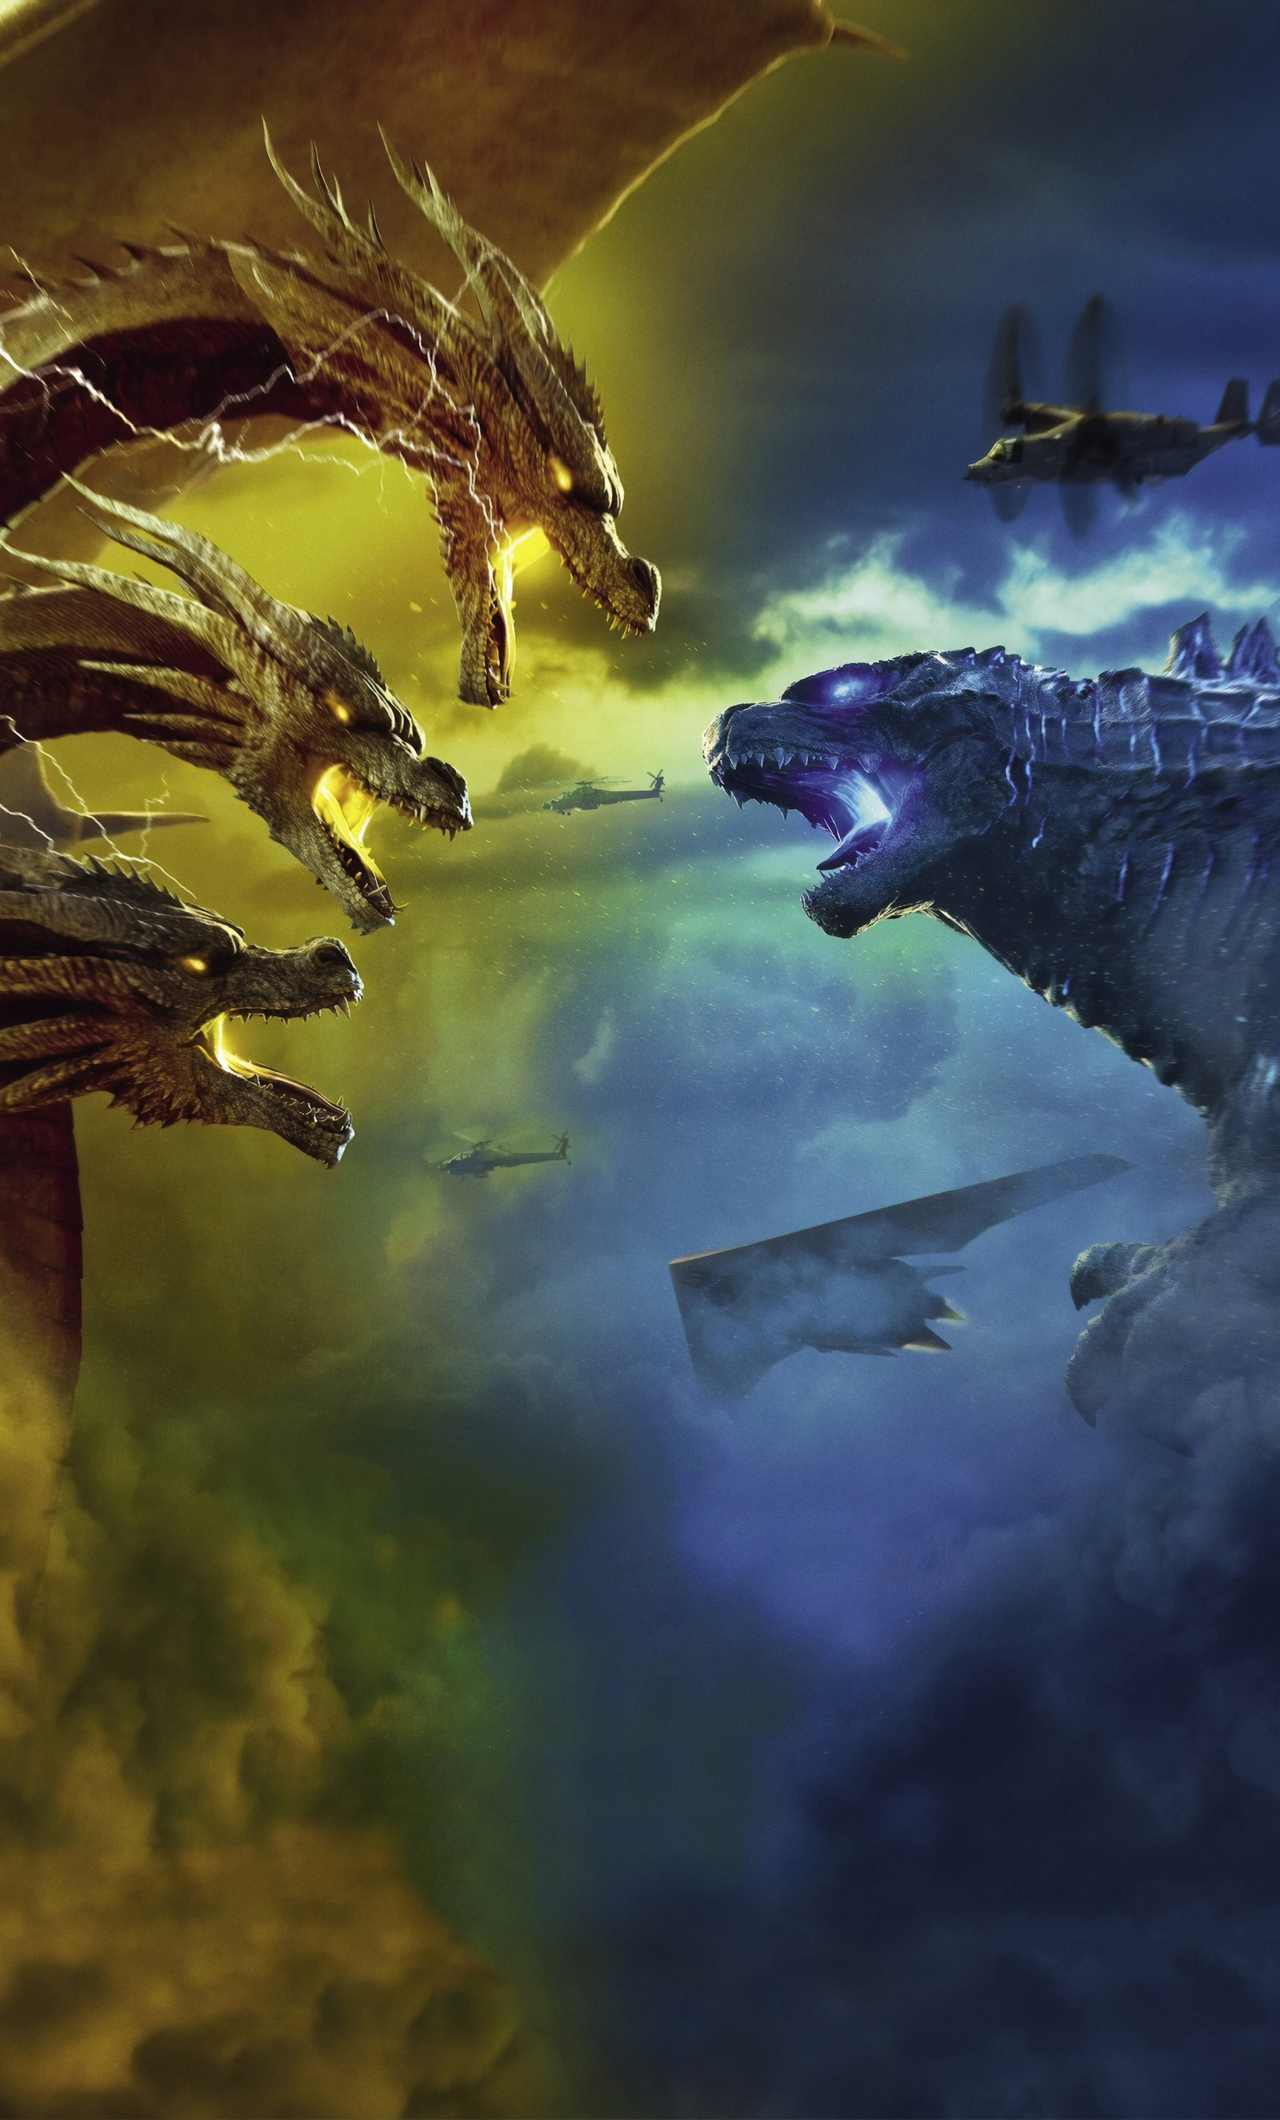 1280x2120 Godzilla King Of The Monsters 4k Iphone 6 Hd 4k